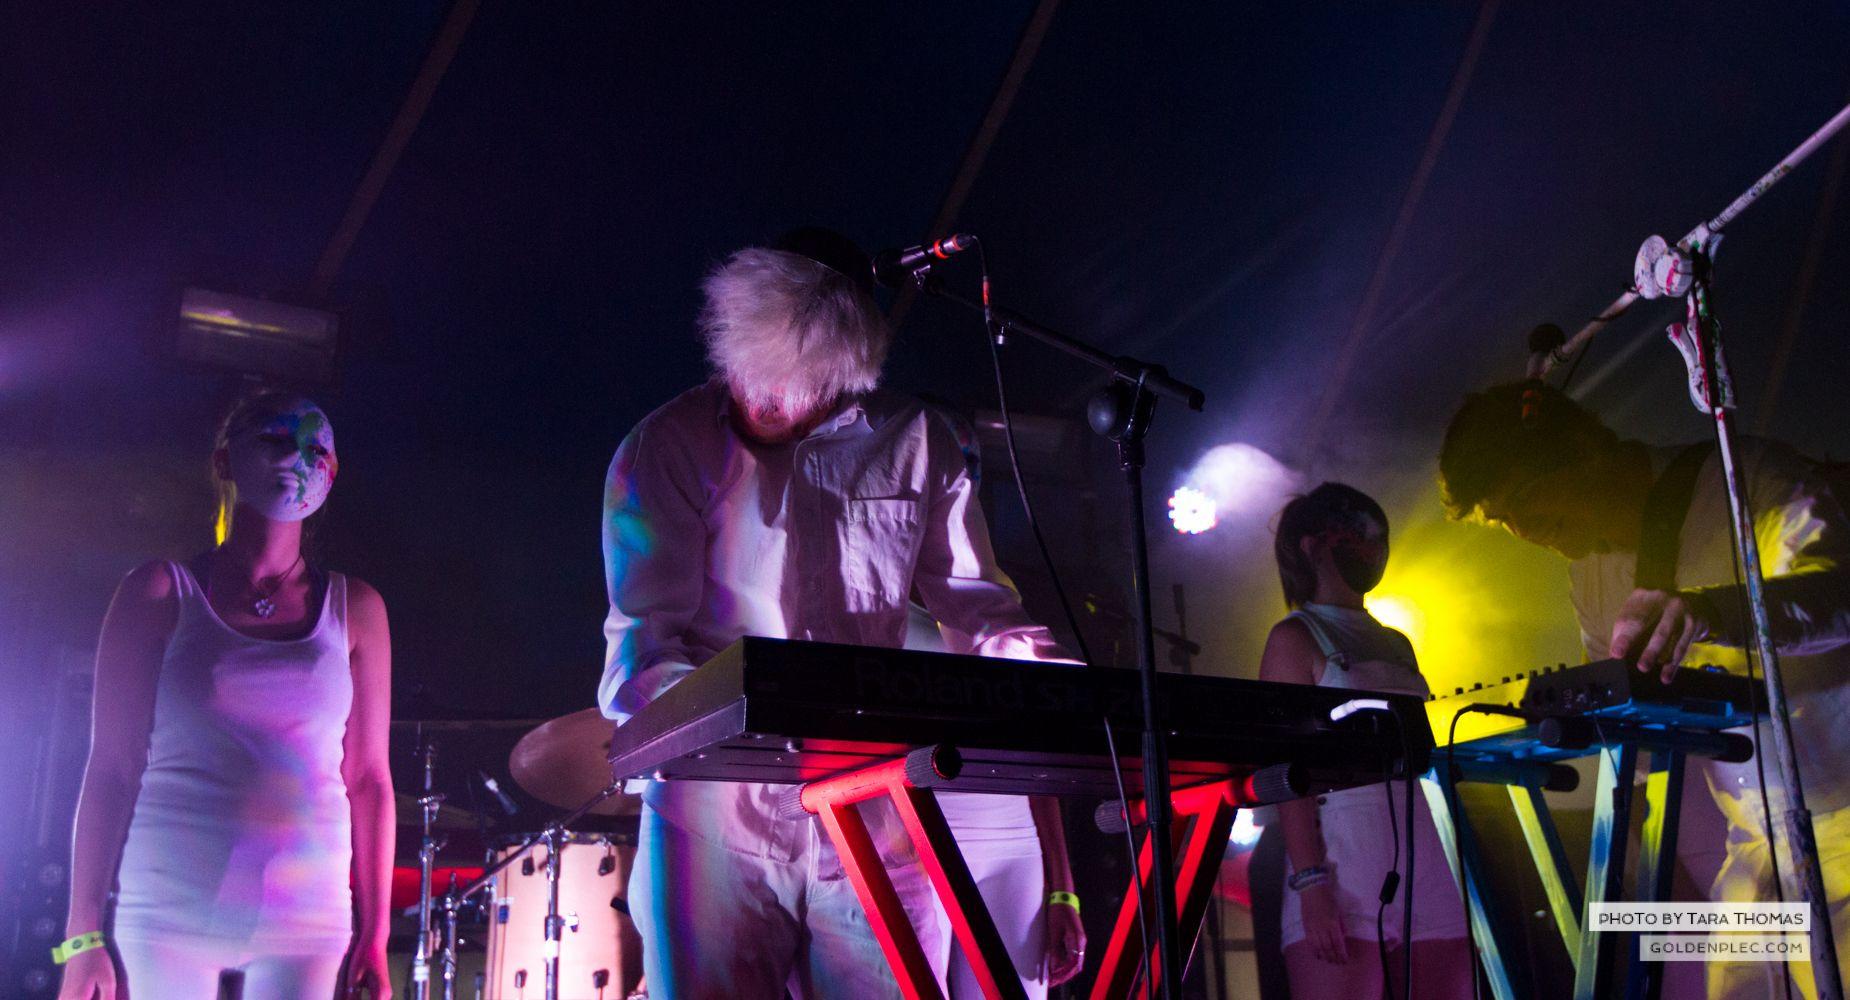 MeltyBrains at Castlepalooza by Tara Thomas